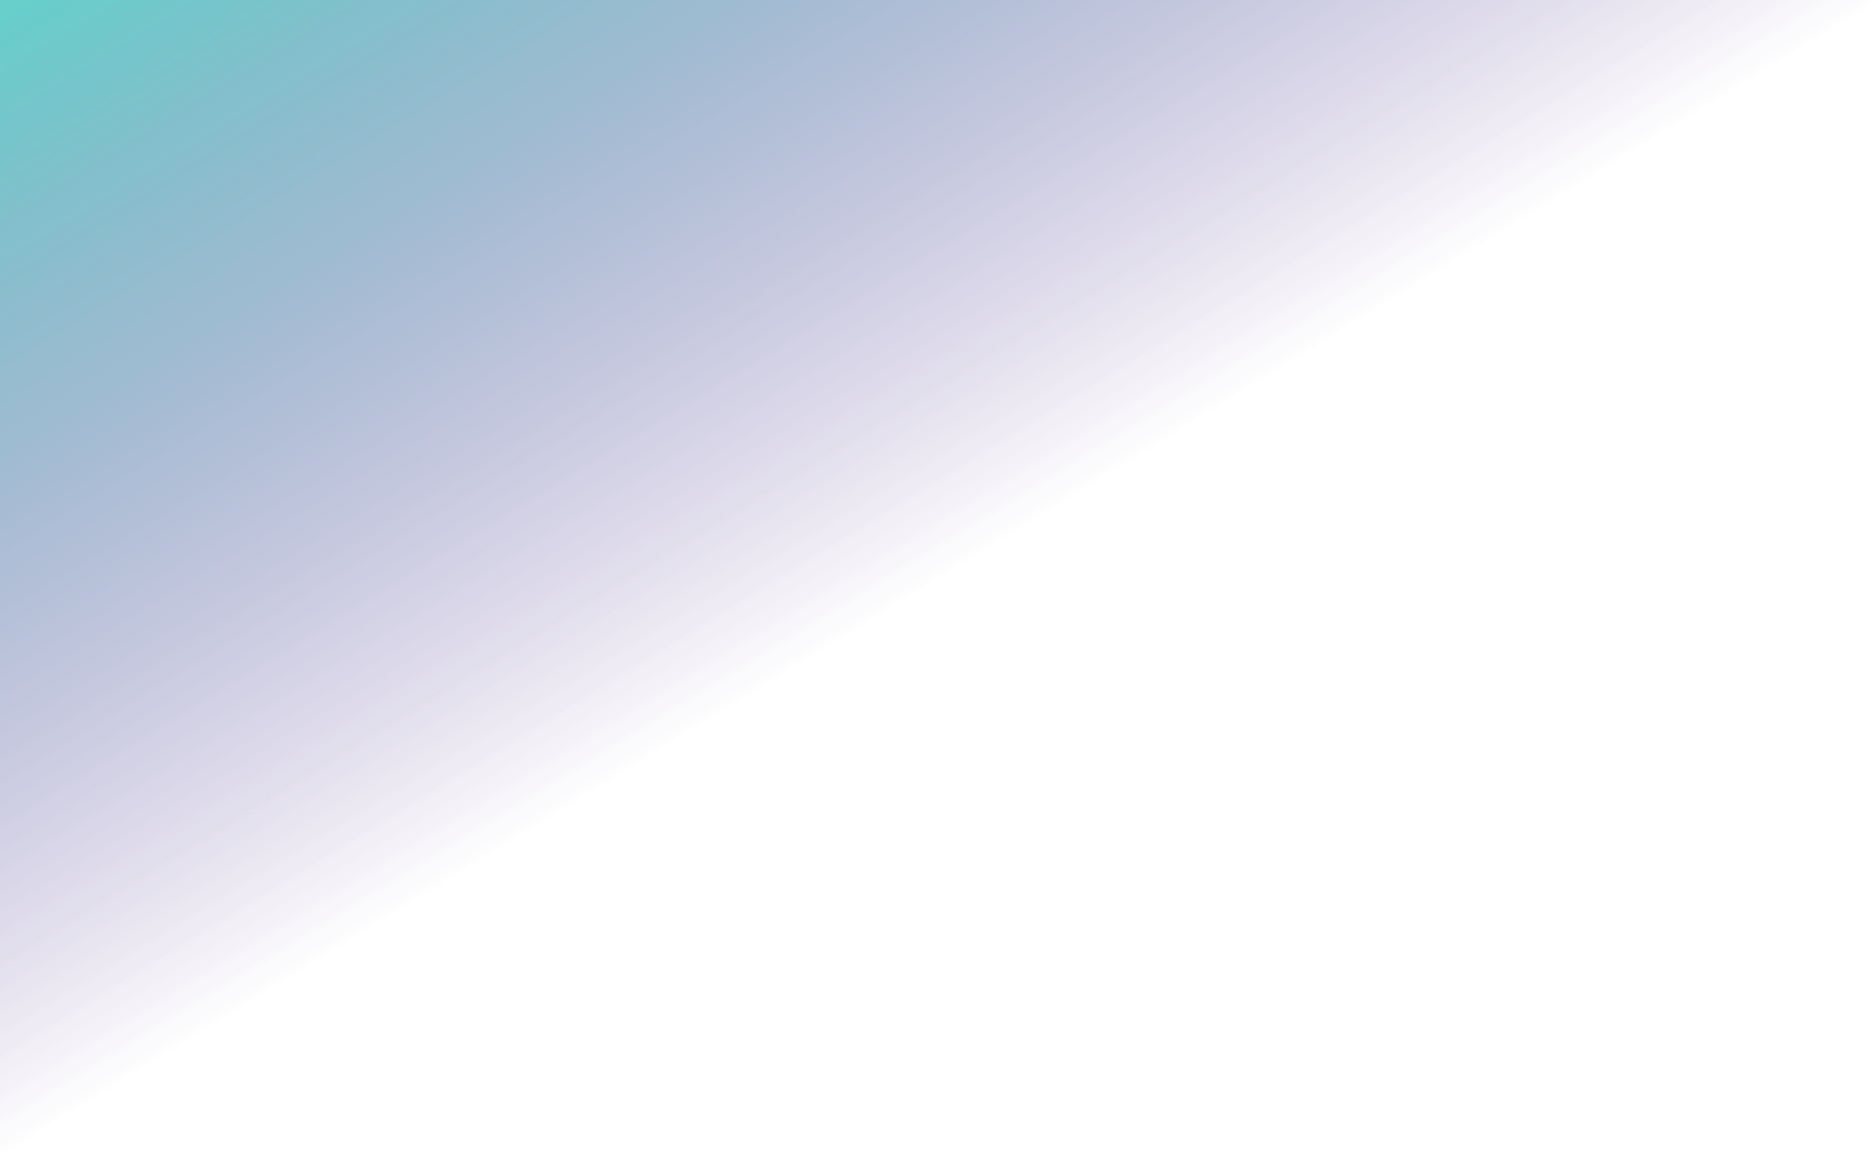 bg-popup-gradient-2.png